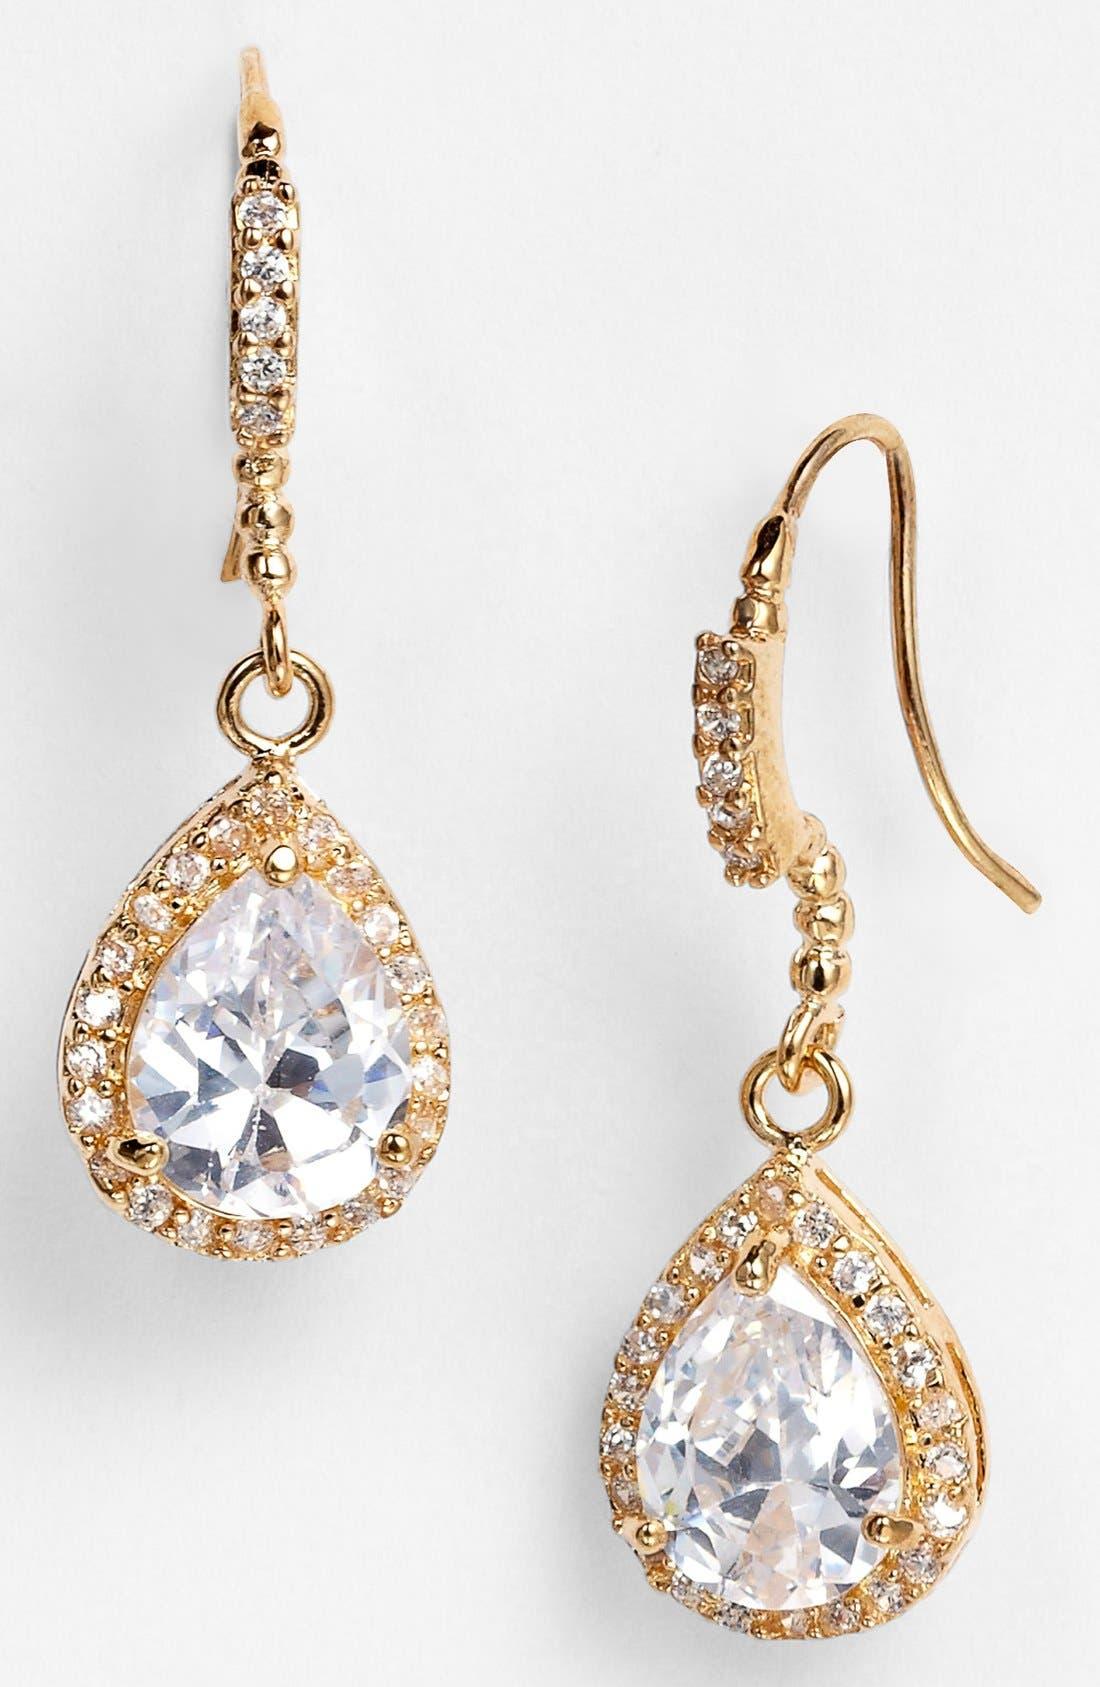 Main Image - Nina 'Gale' Teardrop Earrings